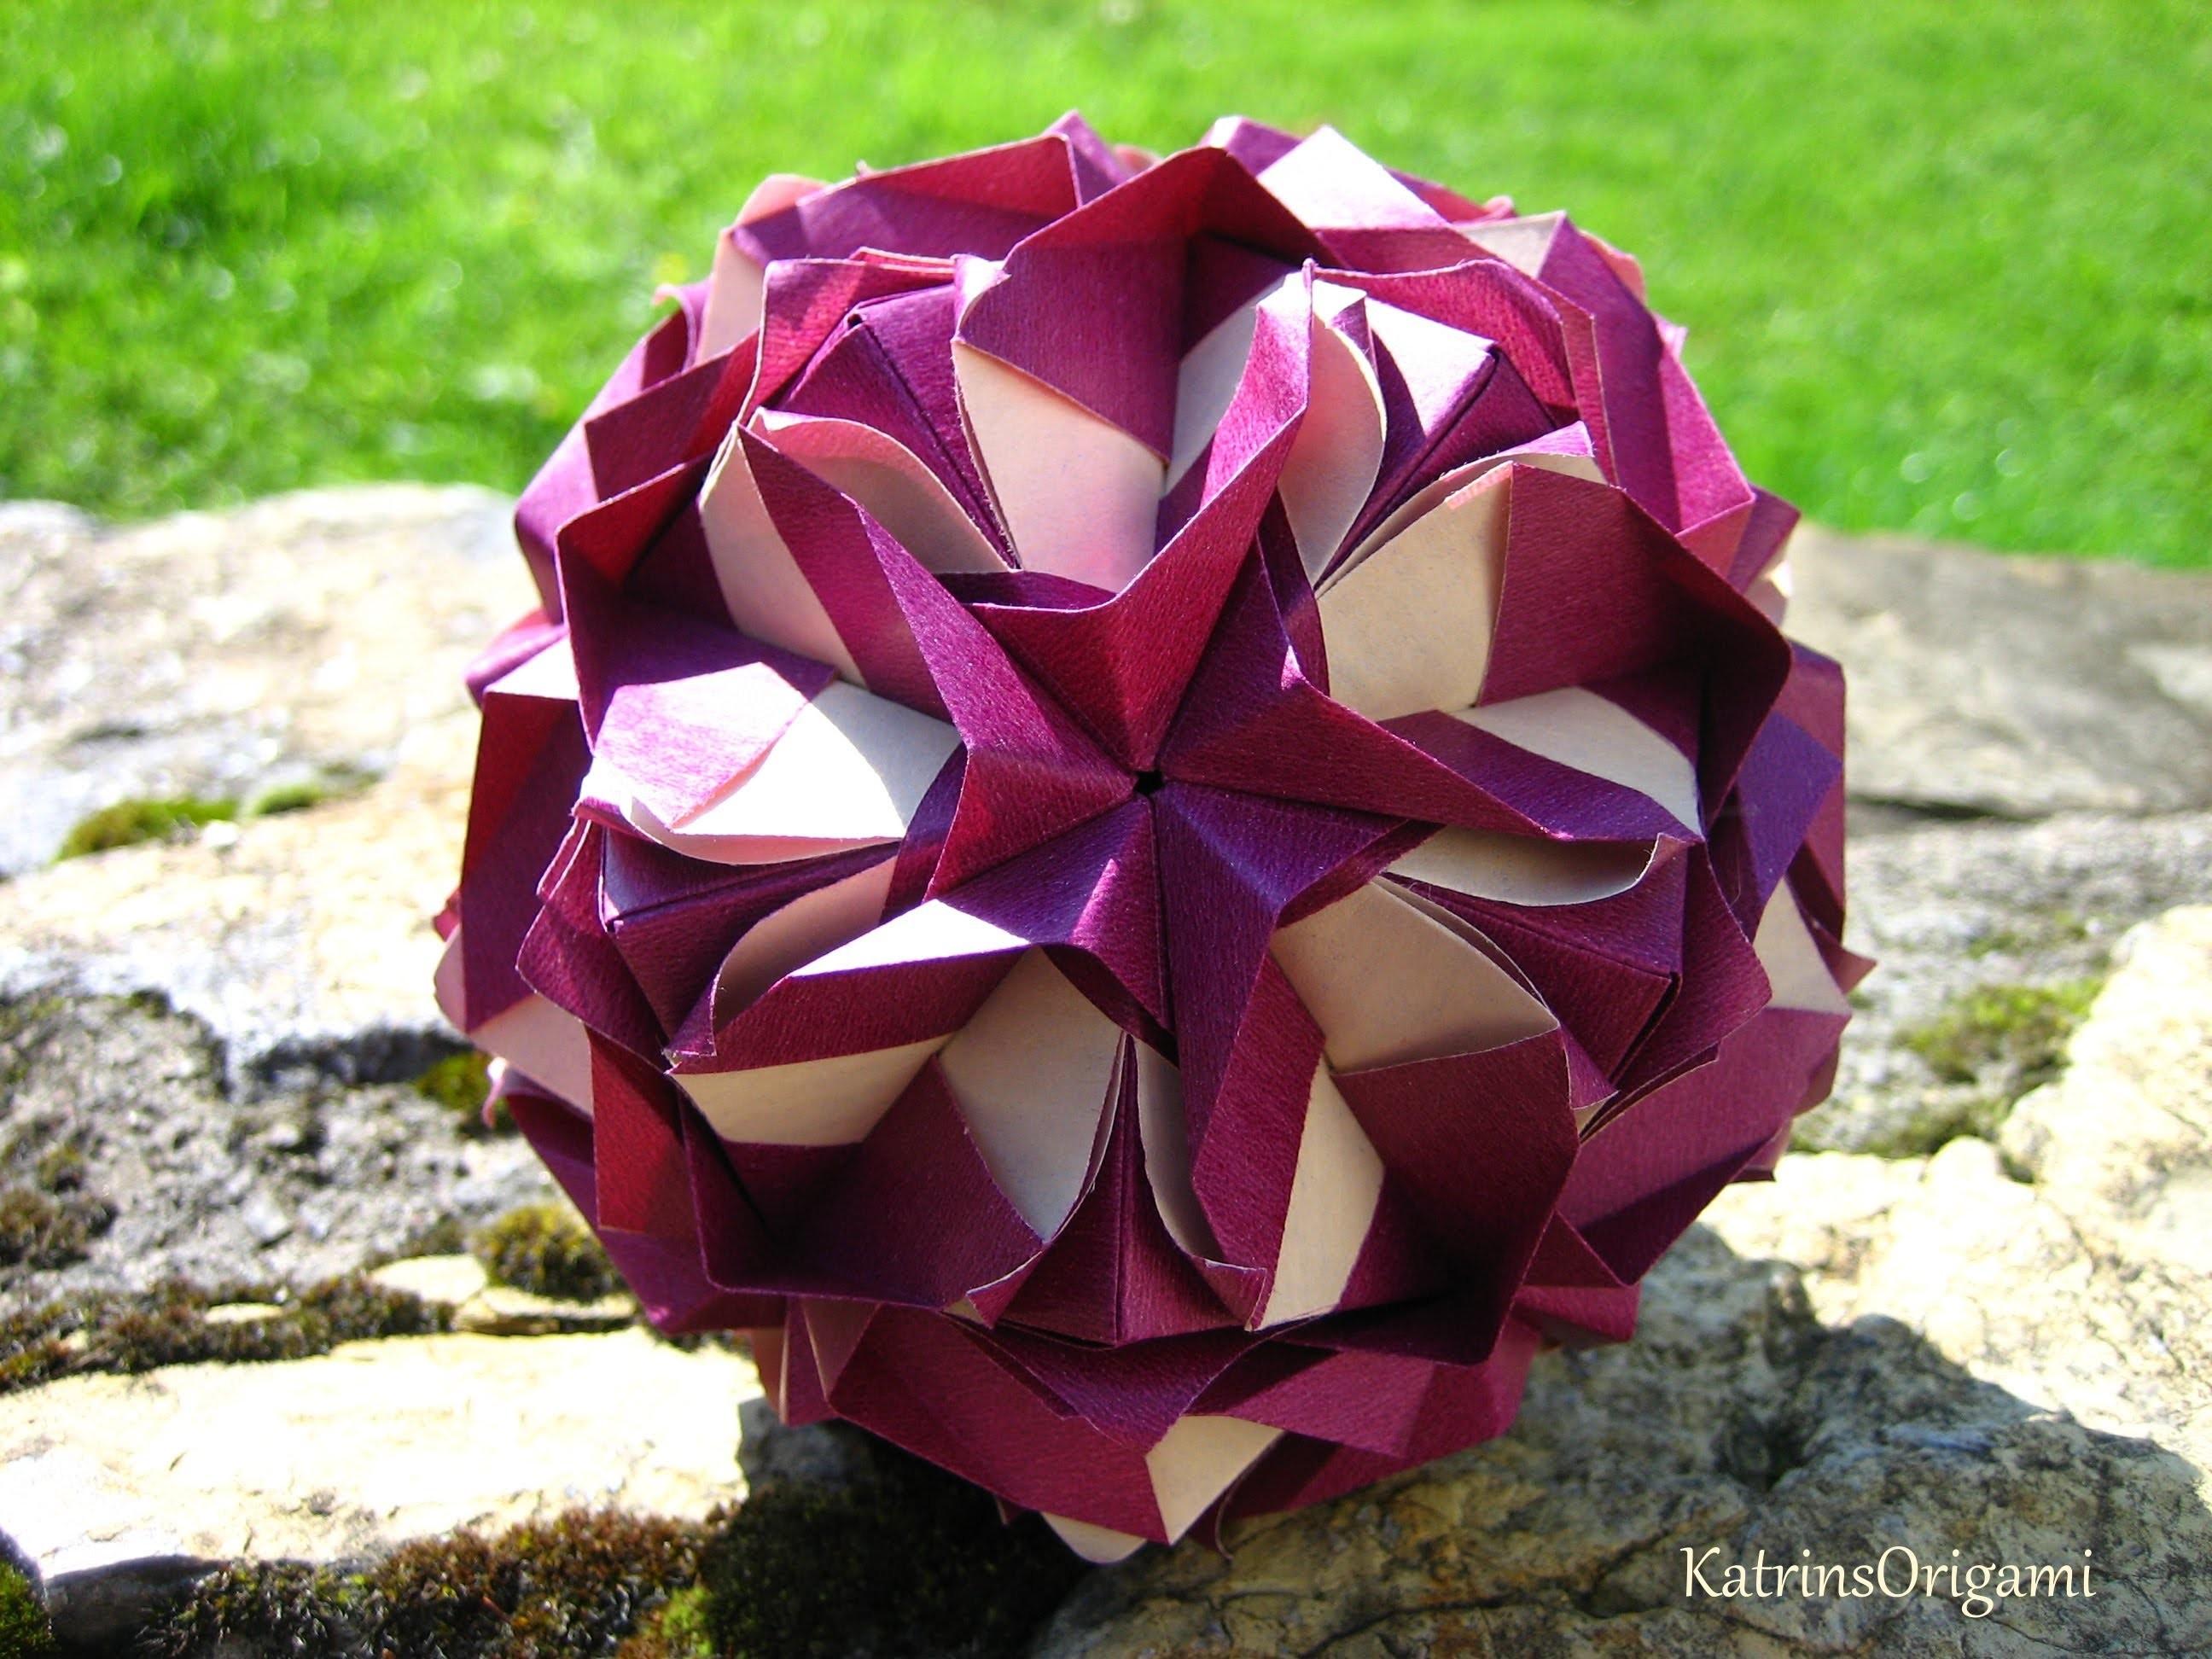 Origami ჱܓ Royal Rose ჱܓ Kusudama